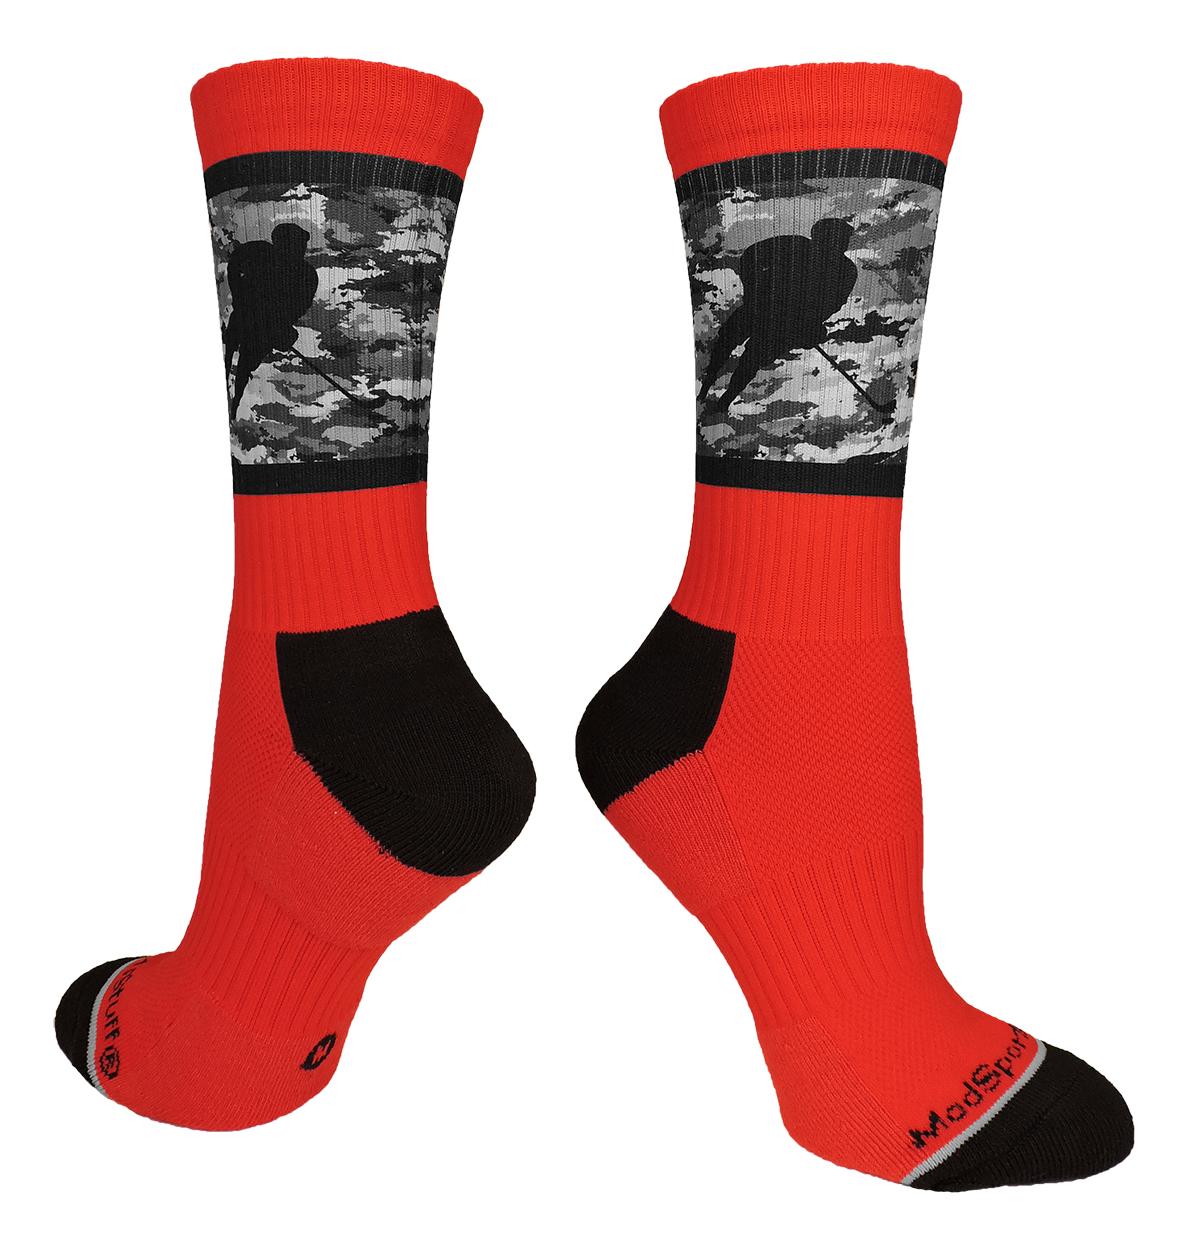 Hockey Player Crew Socks (Red/Black Camo, Small)